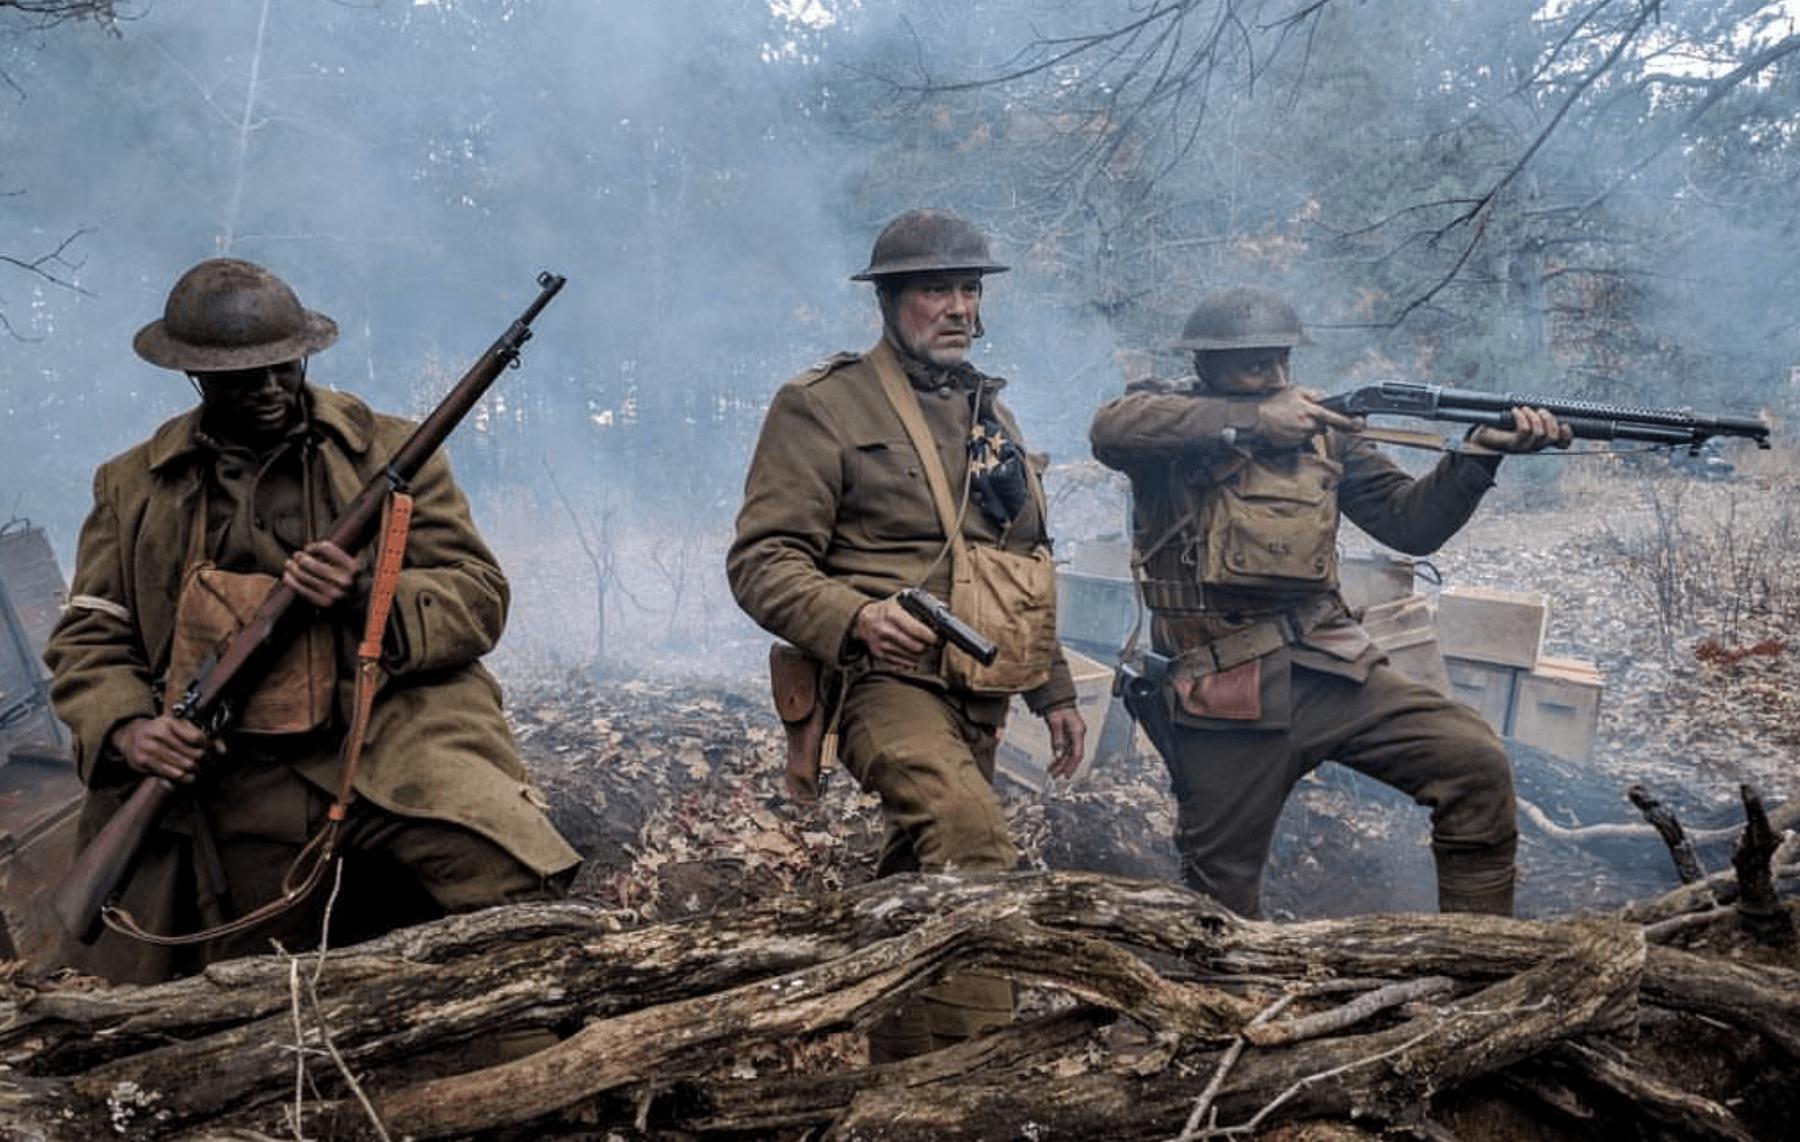 جنگ بزرگ The Great War اثر جنگی دیگر از استیون لوک